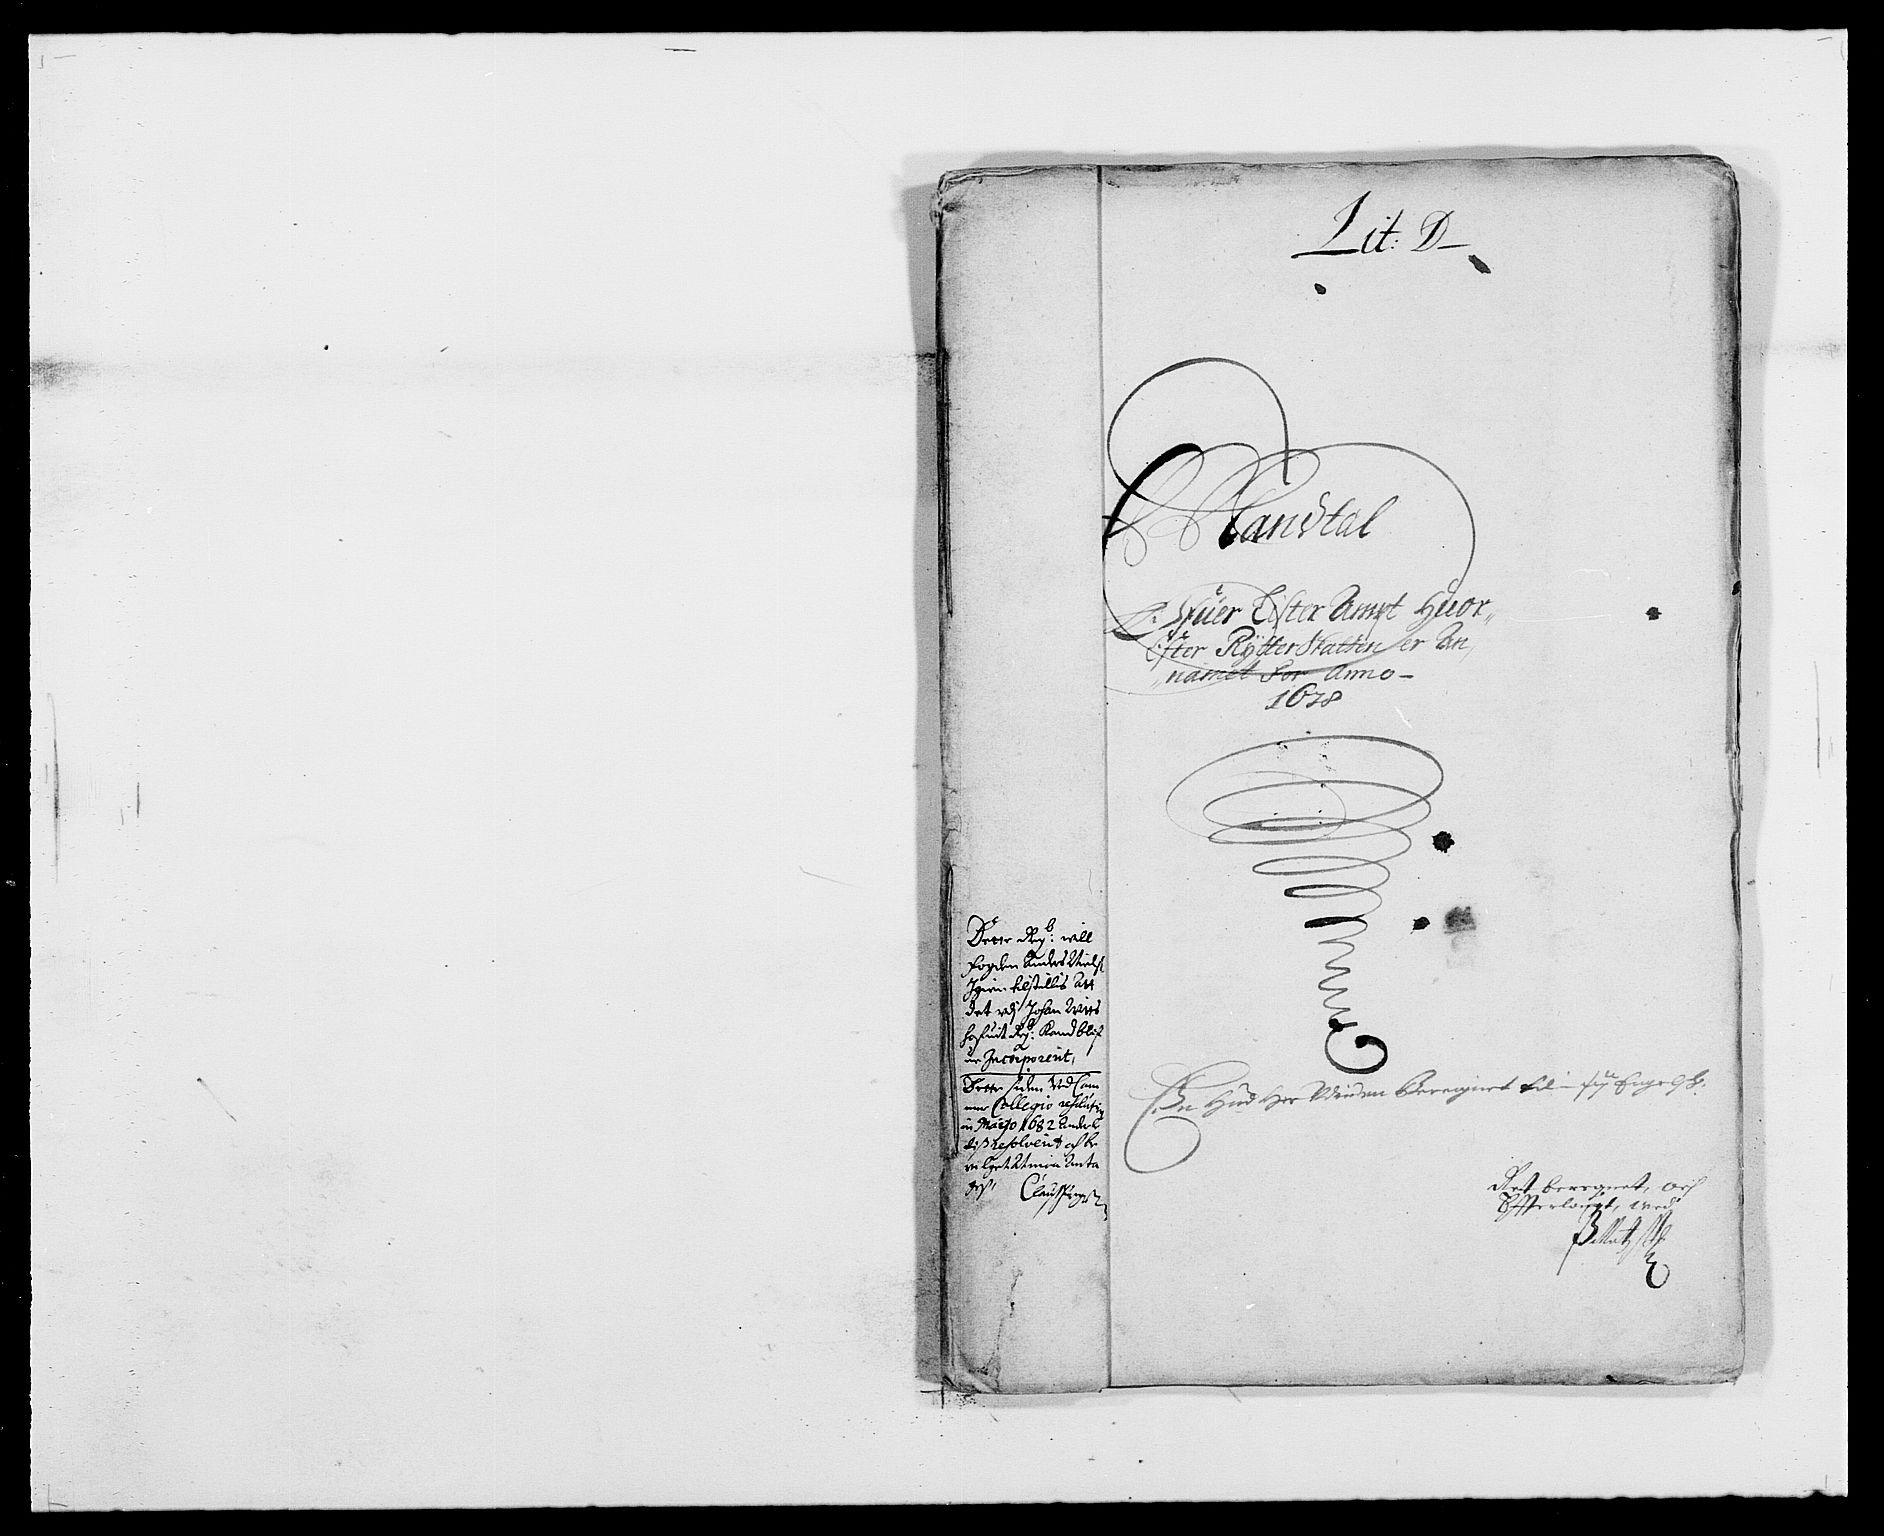 RA, Rentekammeret inntil 1814, Reviderte regnskaper, Fogderegnskap, R41/L2530: Fogderegnskap Lista, 1677-1679, s. 262